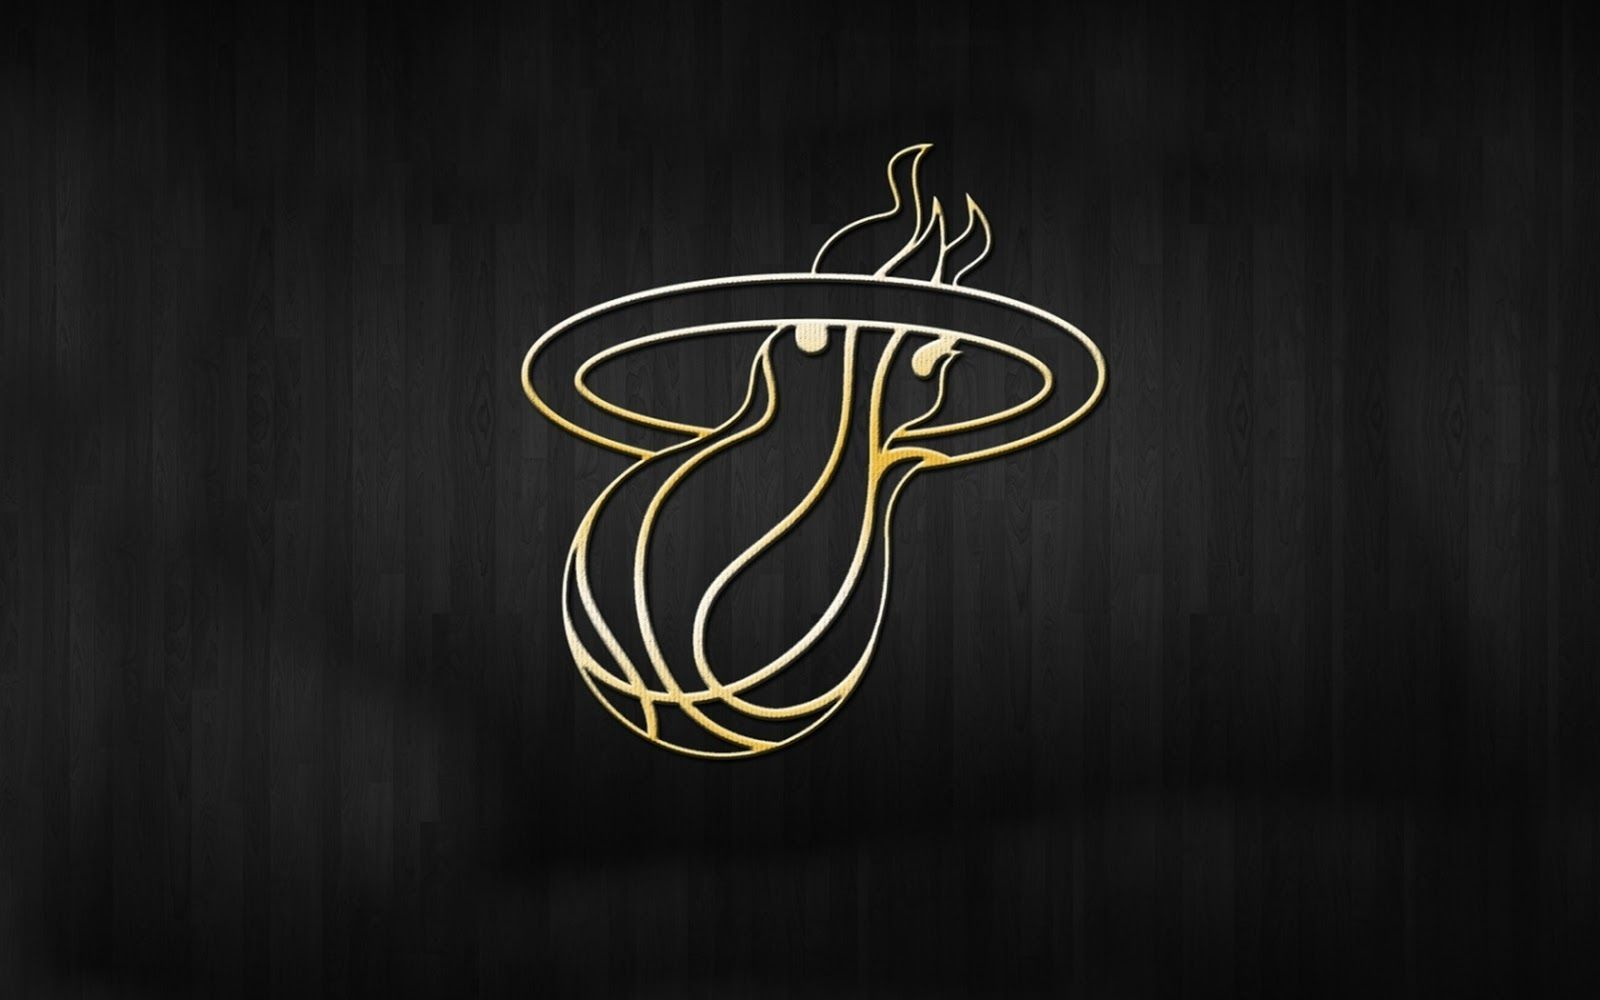 Miami Heat Wallpapers Hd2 Miami Heat Logo Miami Heat Nba Wallpapers